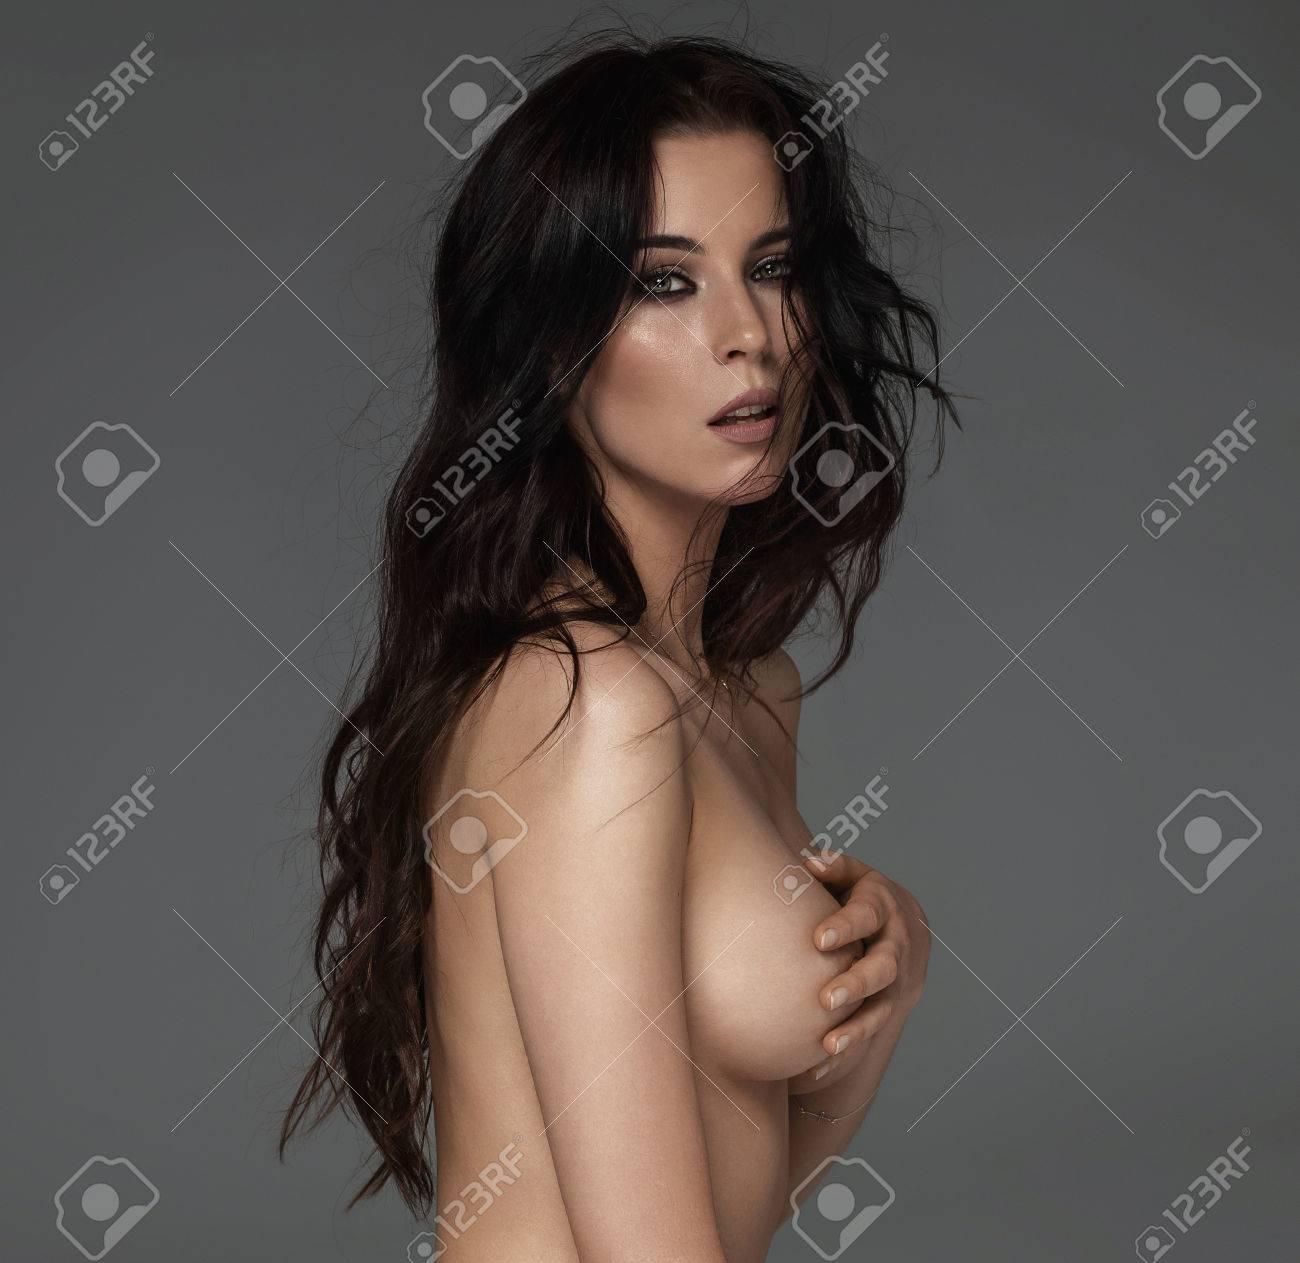 fuck hard sexy hot babe gif models